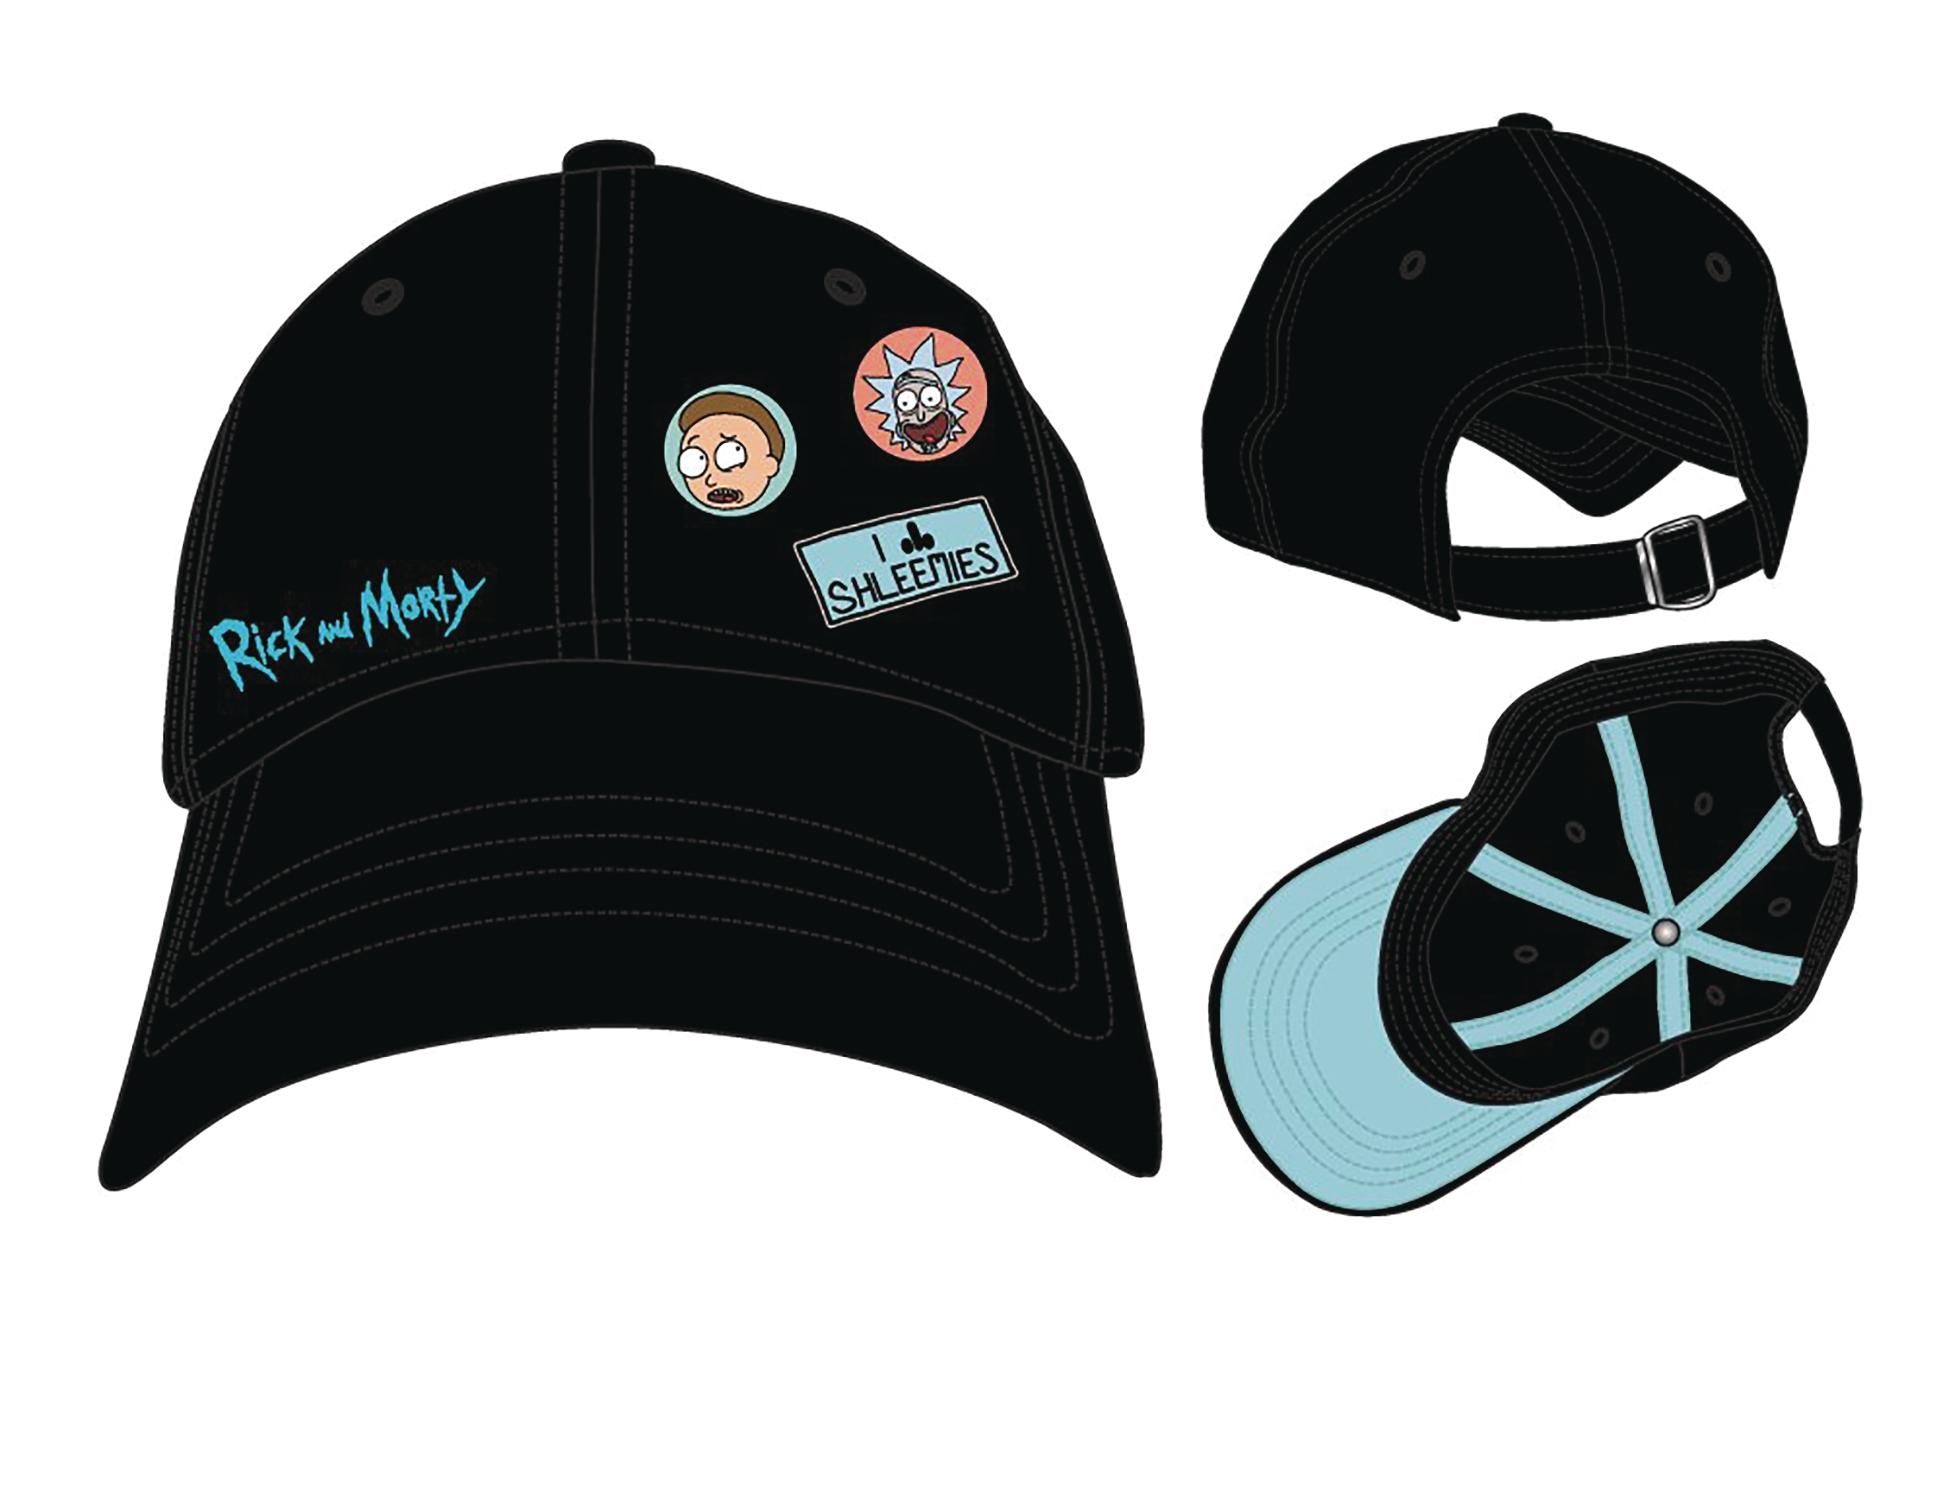 JUN178519 - RICK AND MORTY CAP WITH PINS - Previews World